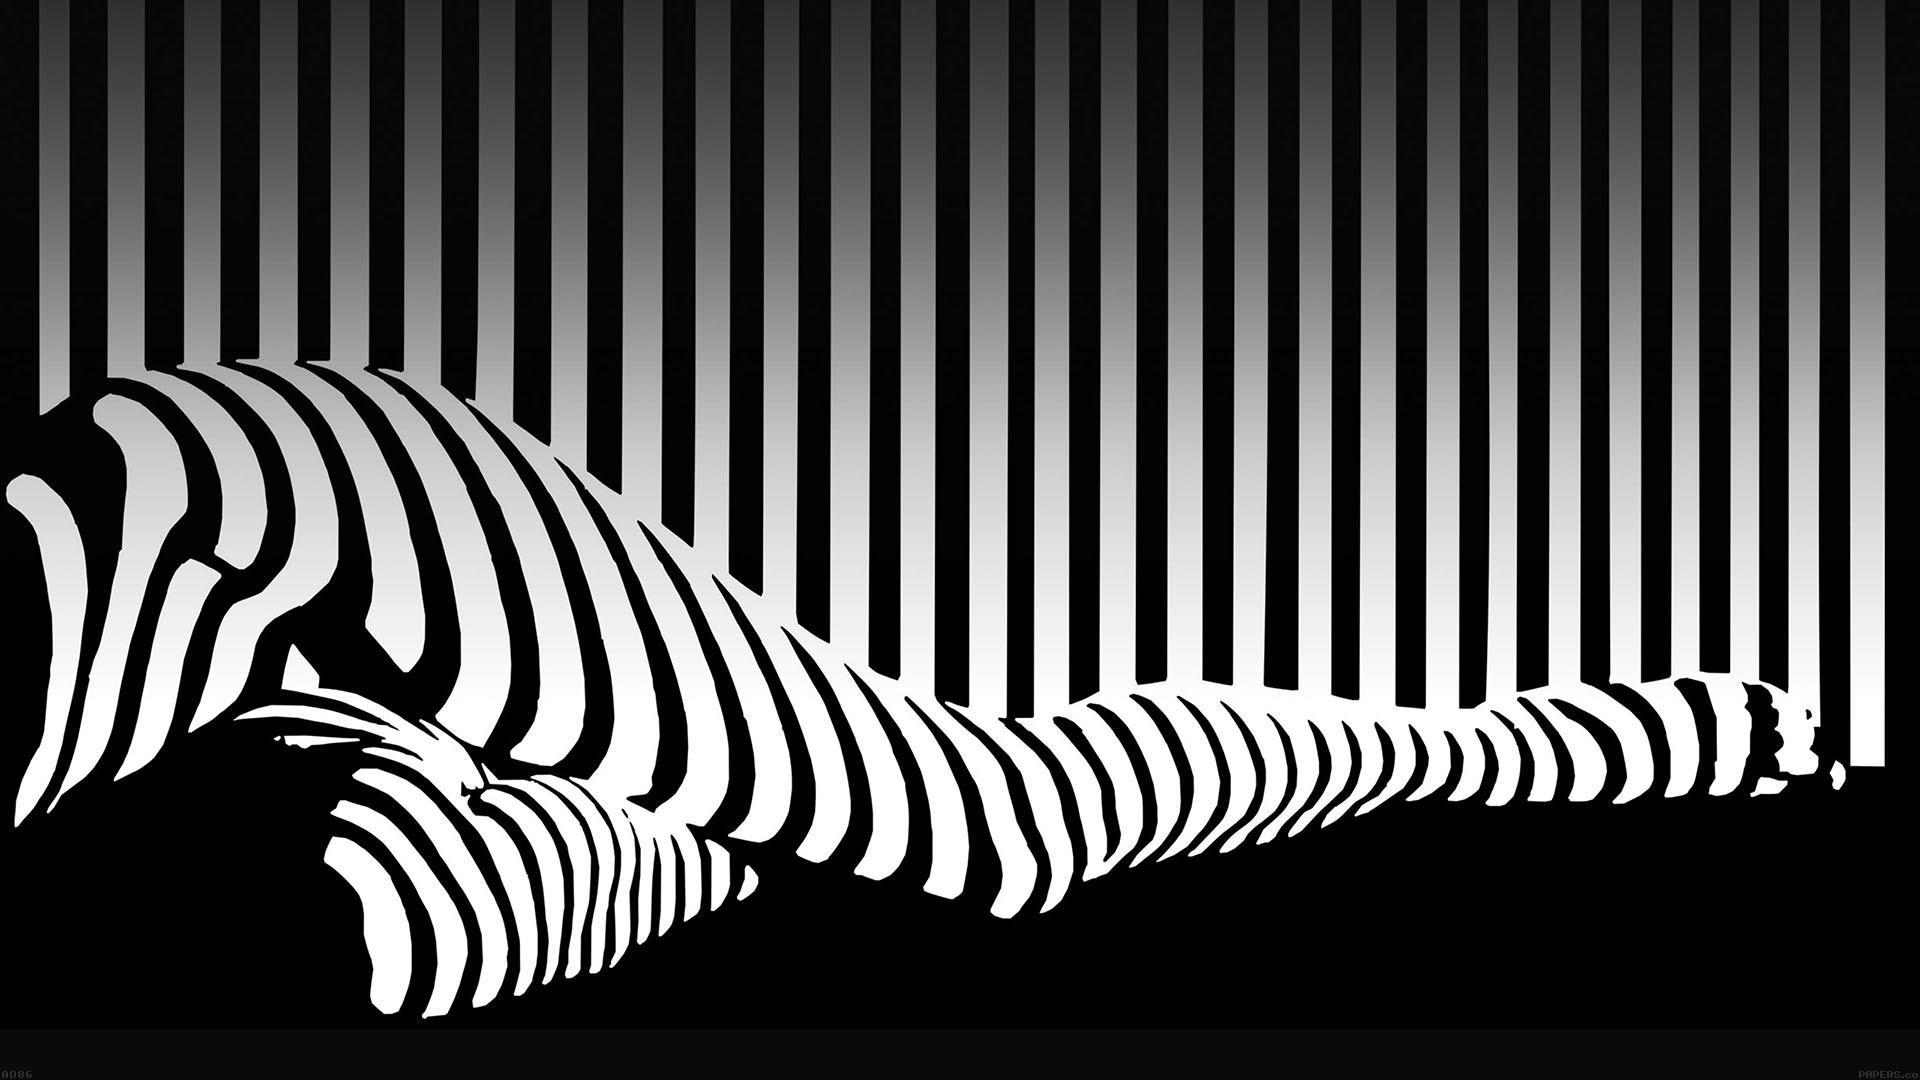 Minimalistic Stripes wallpaper image